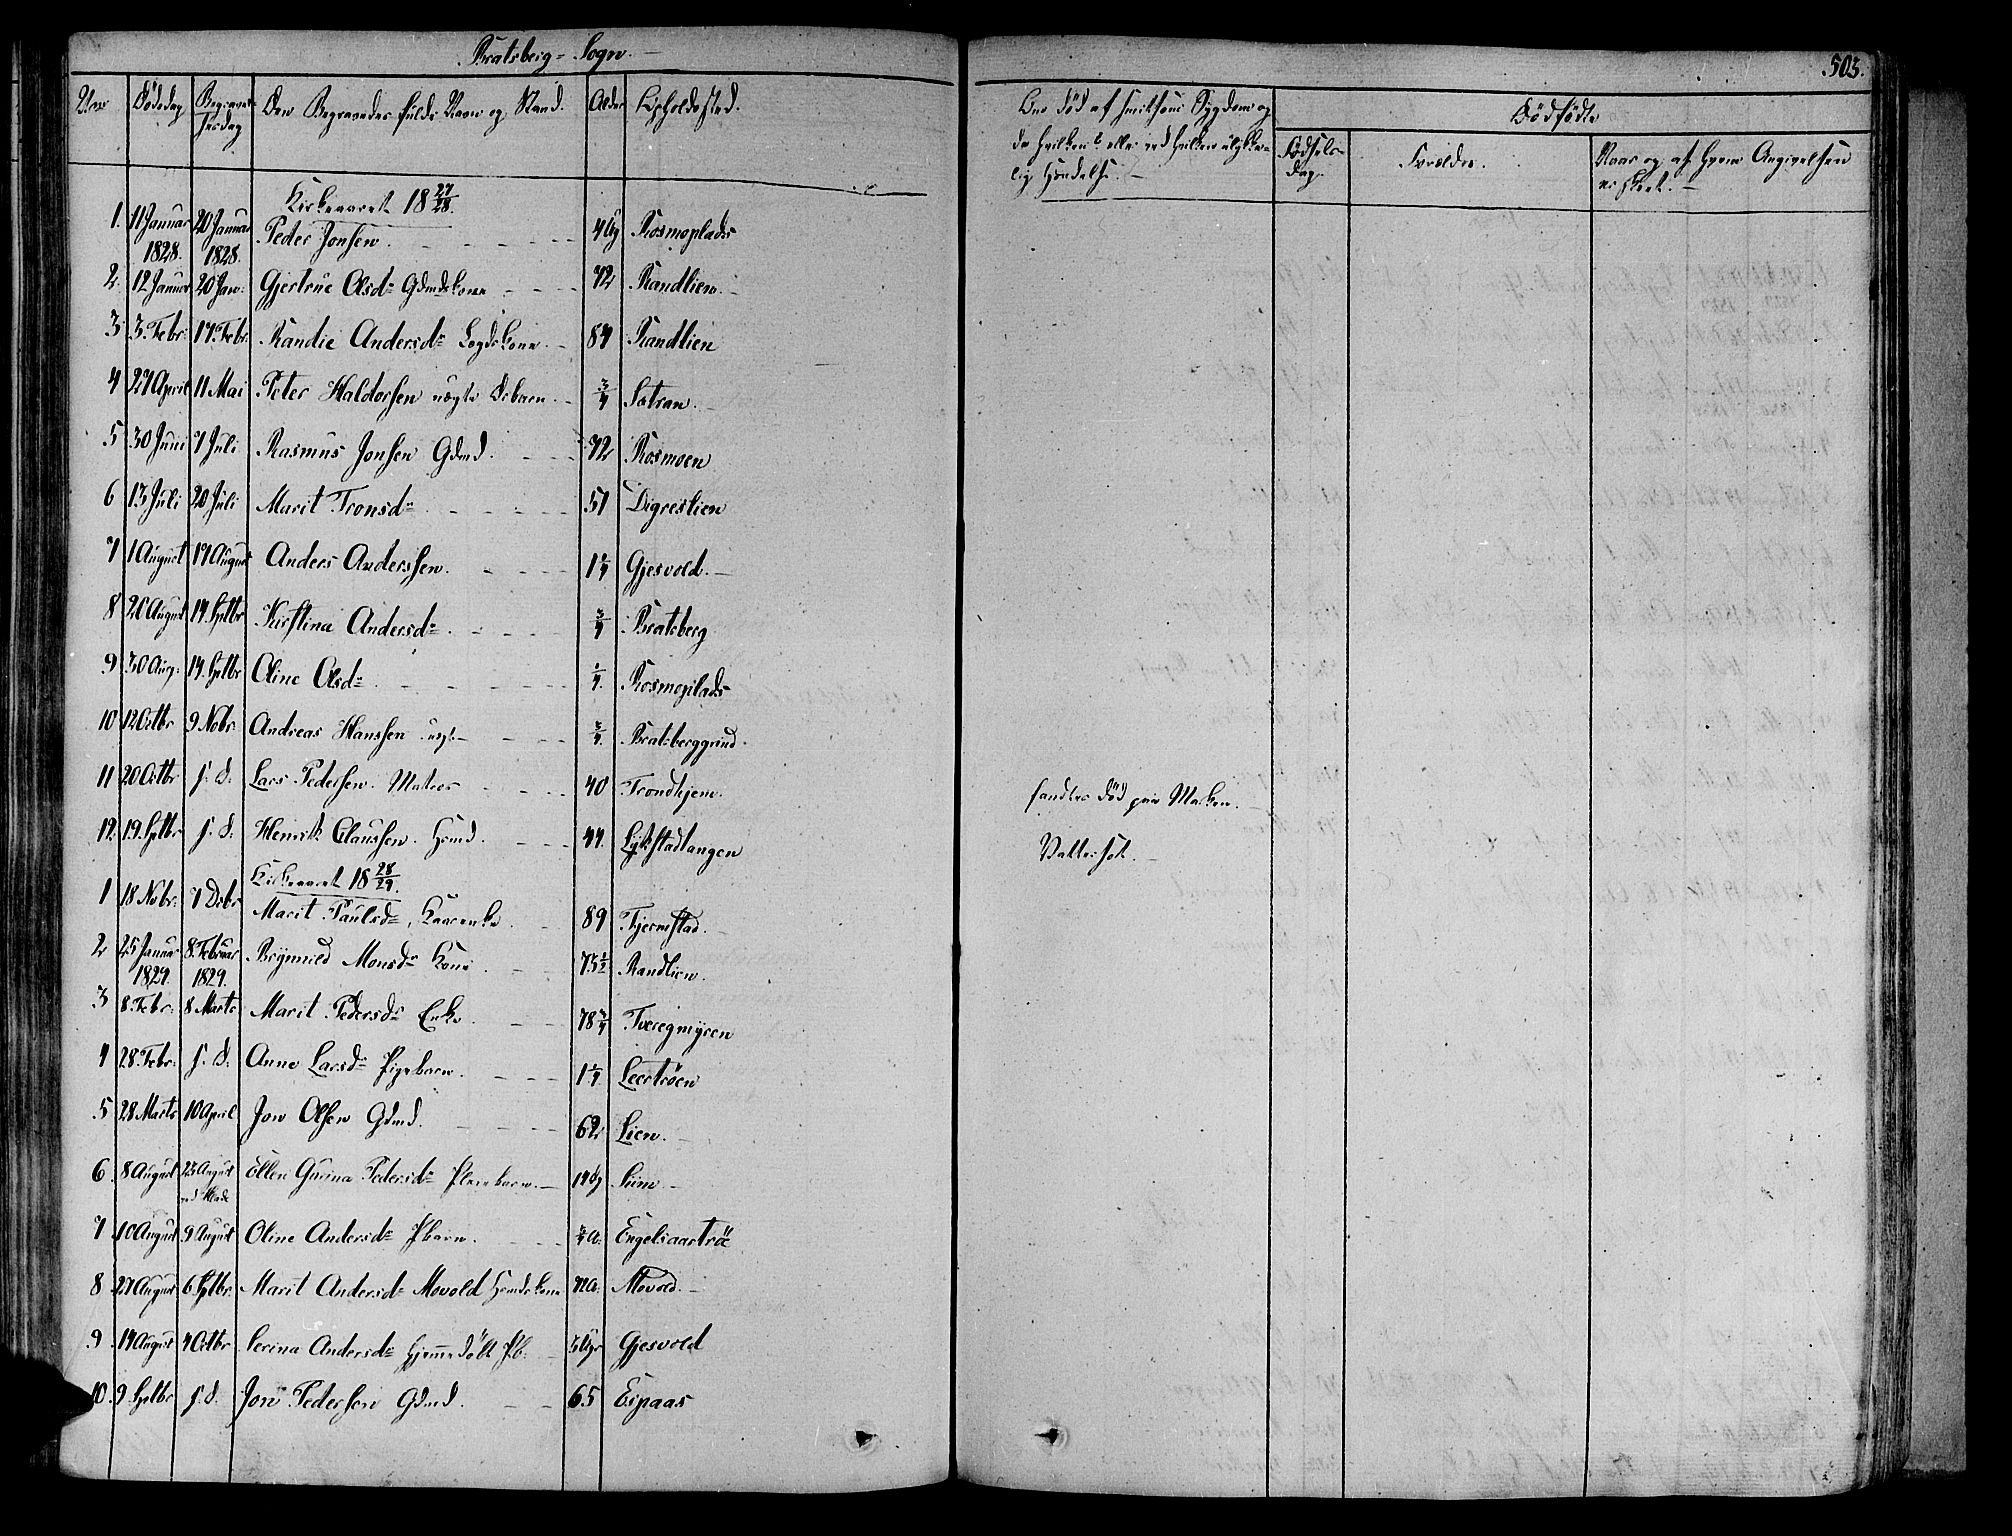 SAT, Ministerialprotokoller, klokkerbøker og fødselsregistre - Sør-Trøndelag, 606/L0289: Parish register (official) no. 606A04 /4, 1826-1840, p. 503